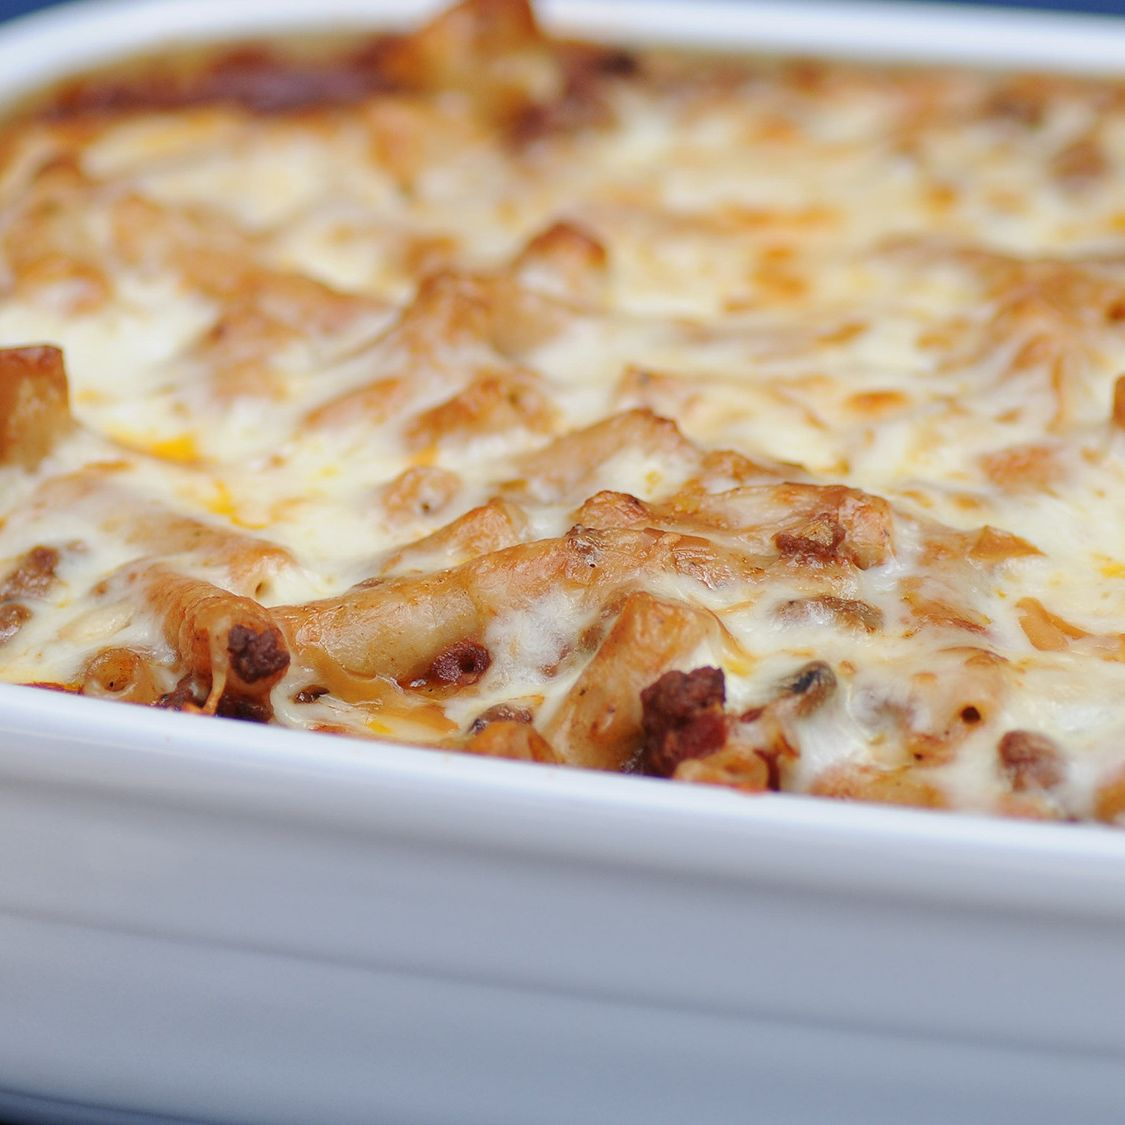 stubbs_smokey_gluten_free_pasta_bake.jpg